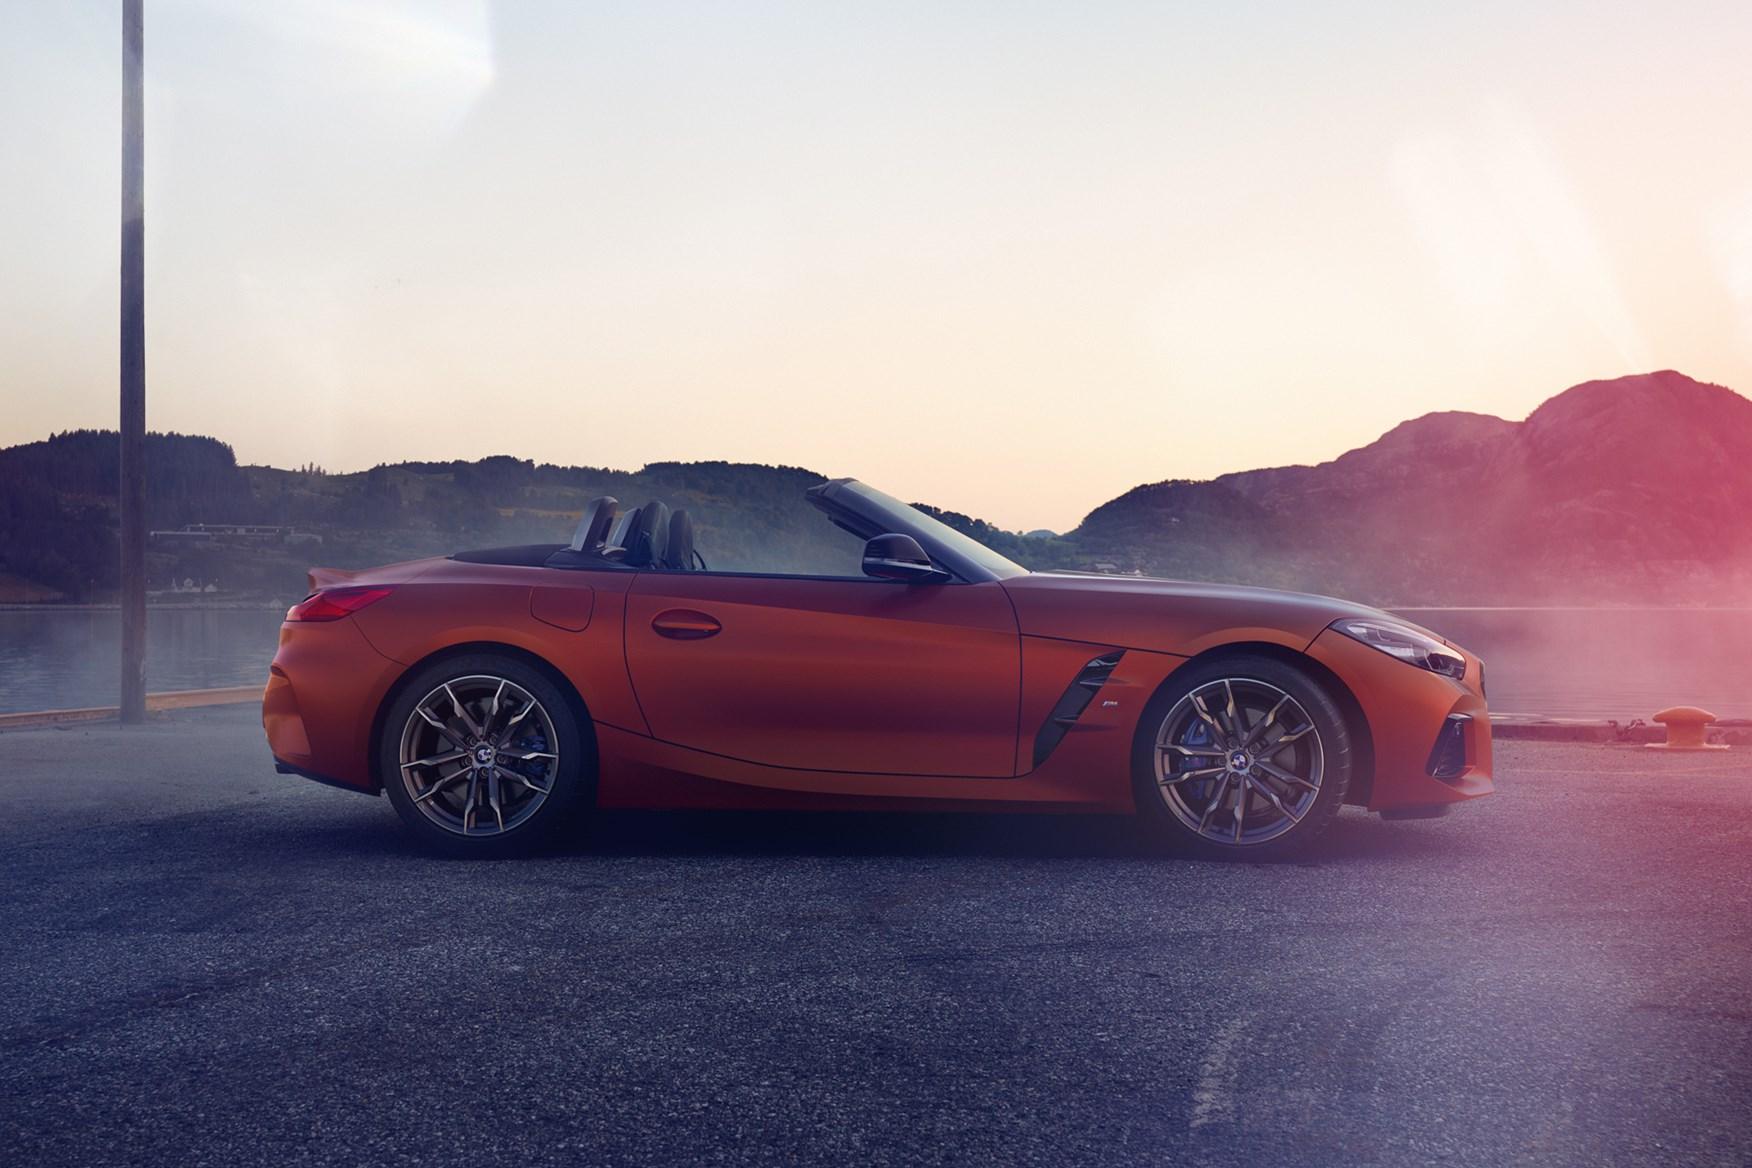 BMW Z4 (2019) M40i First Edition side profile